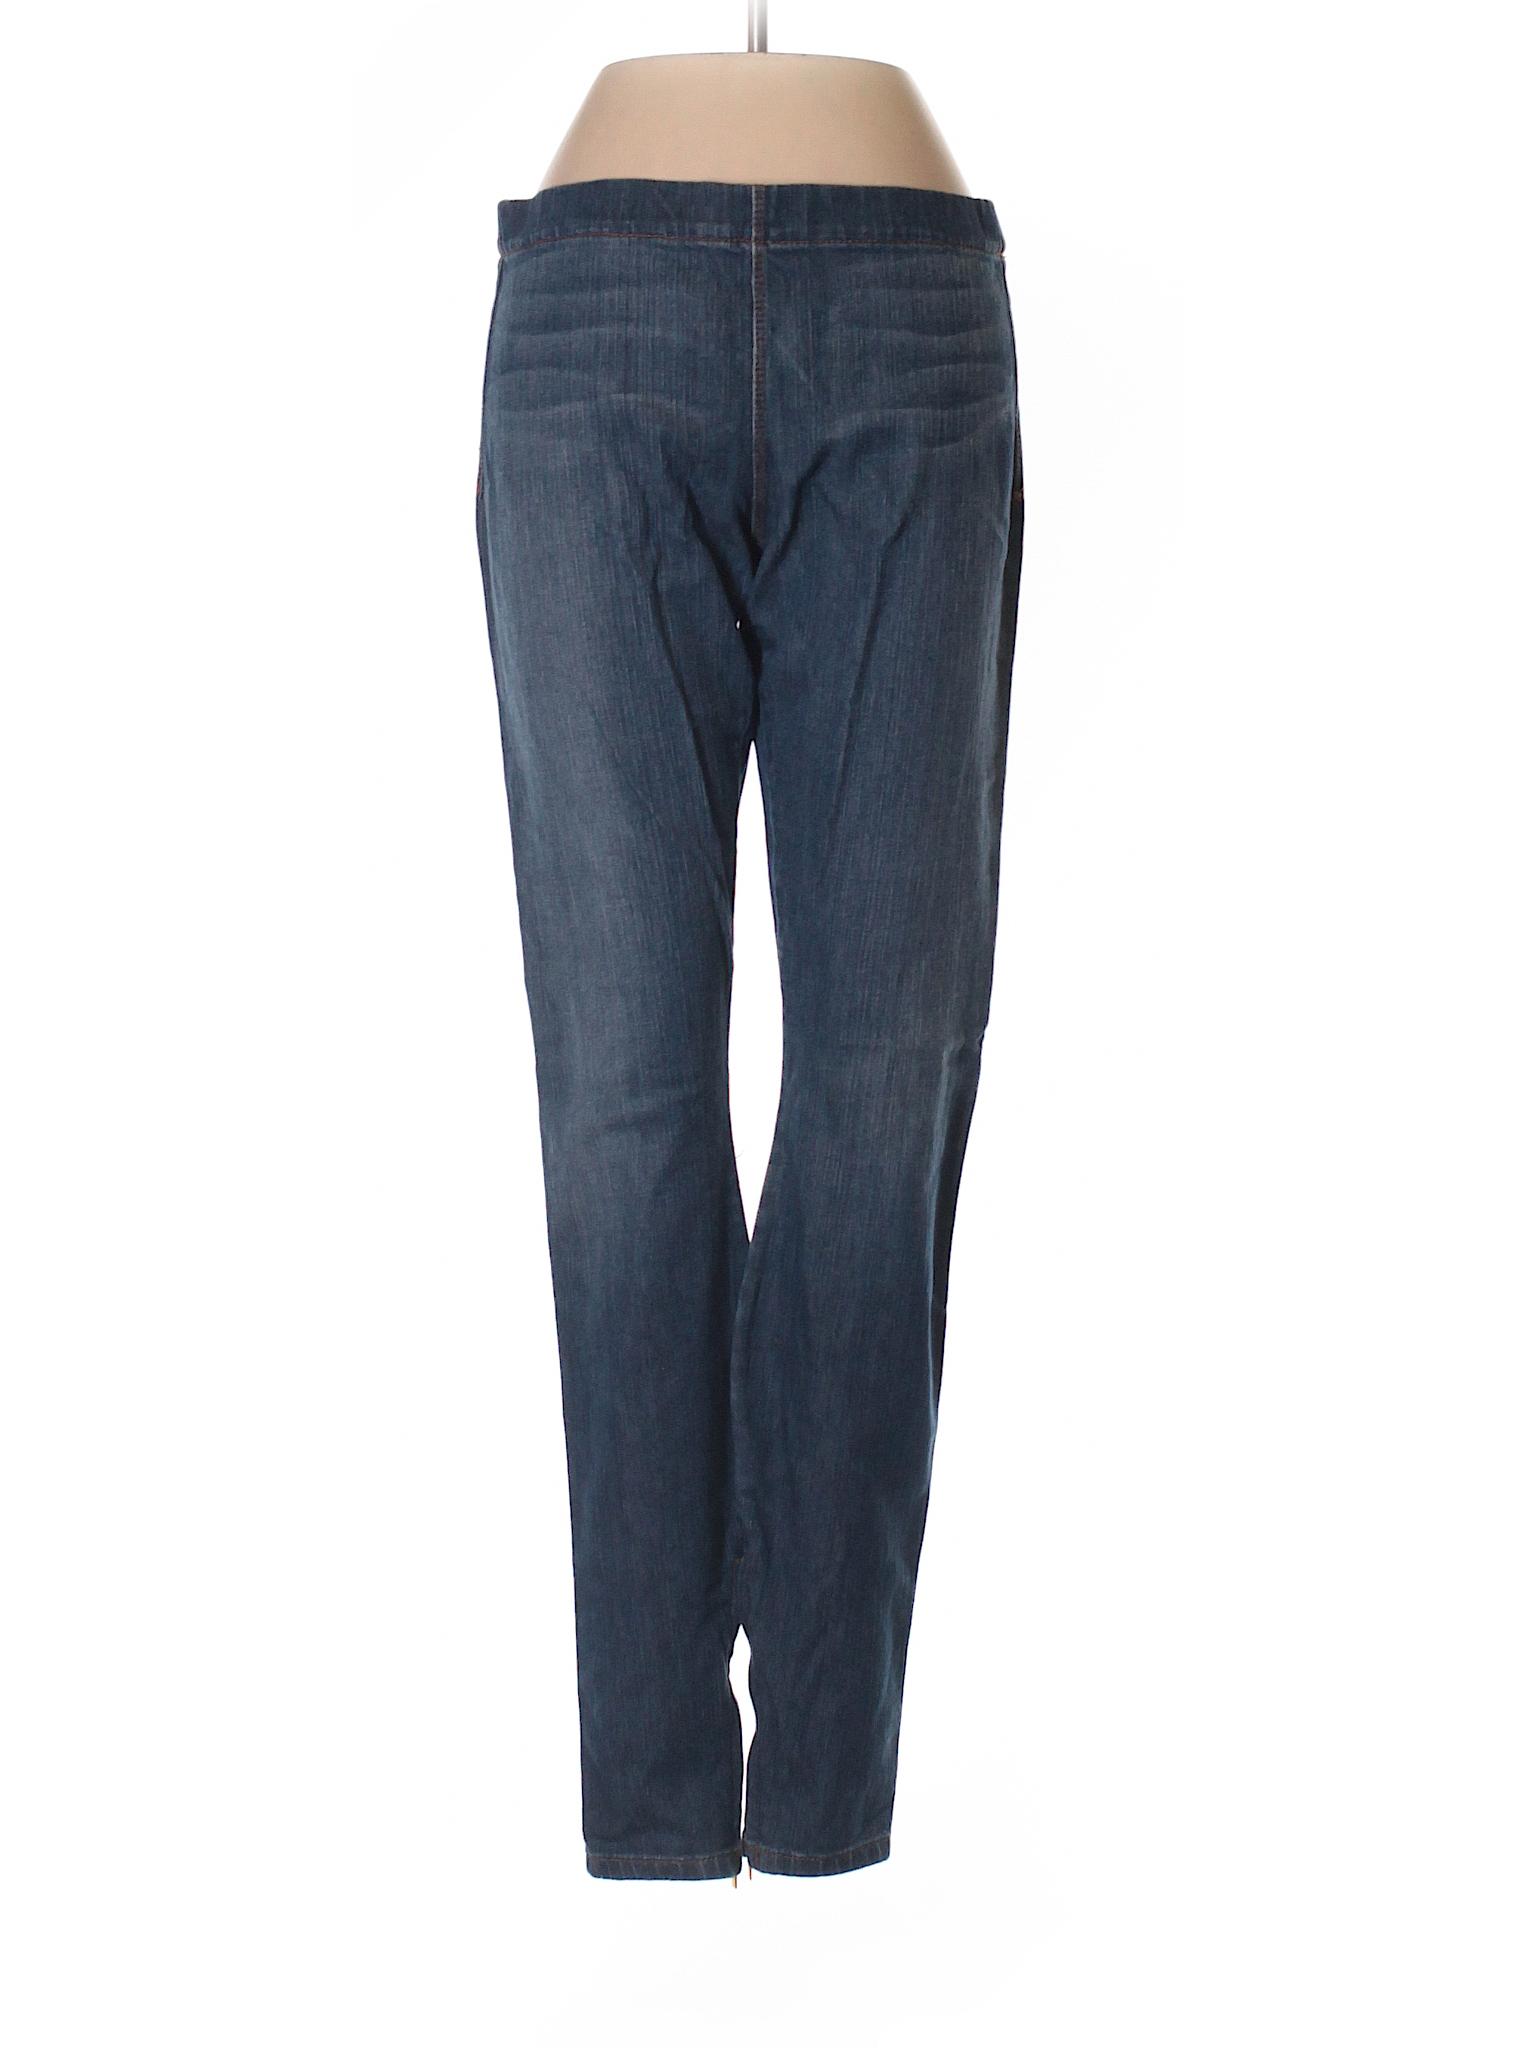 Jeans Promotion Jeans Promotion Joe's Joe's dR6xd